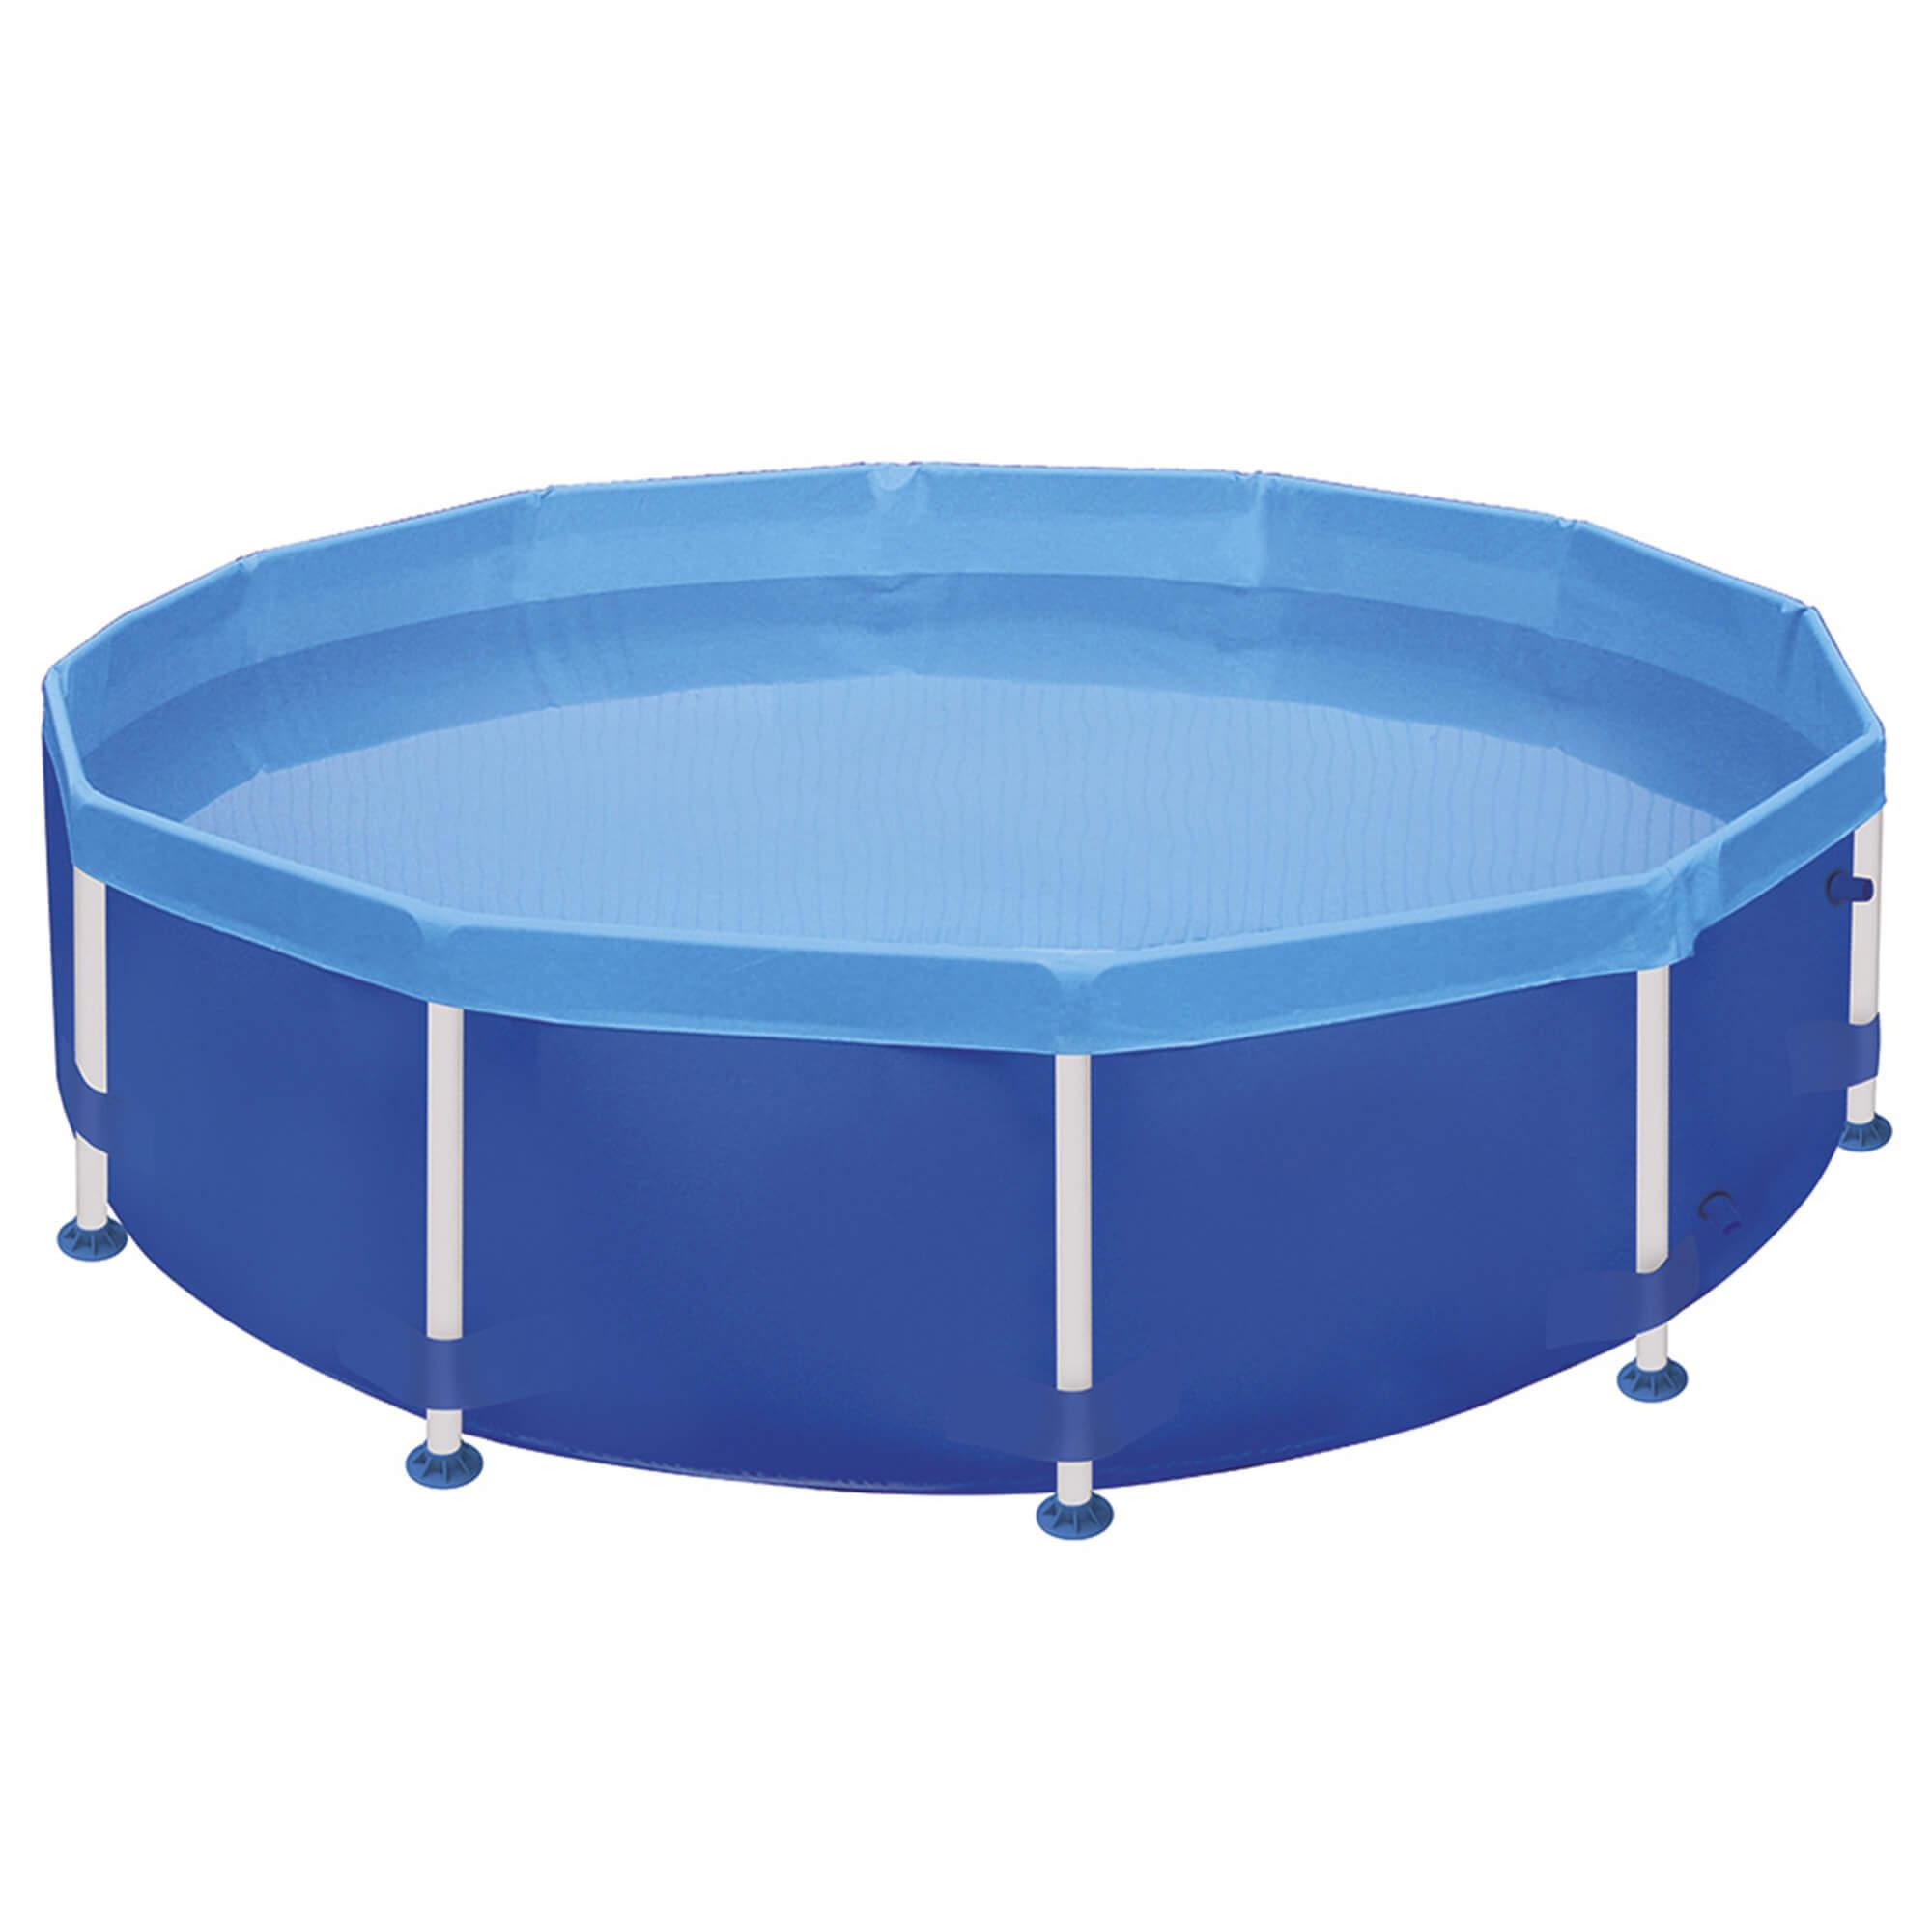 Piscina Circular Mor 4.500 litros com estruturas